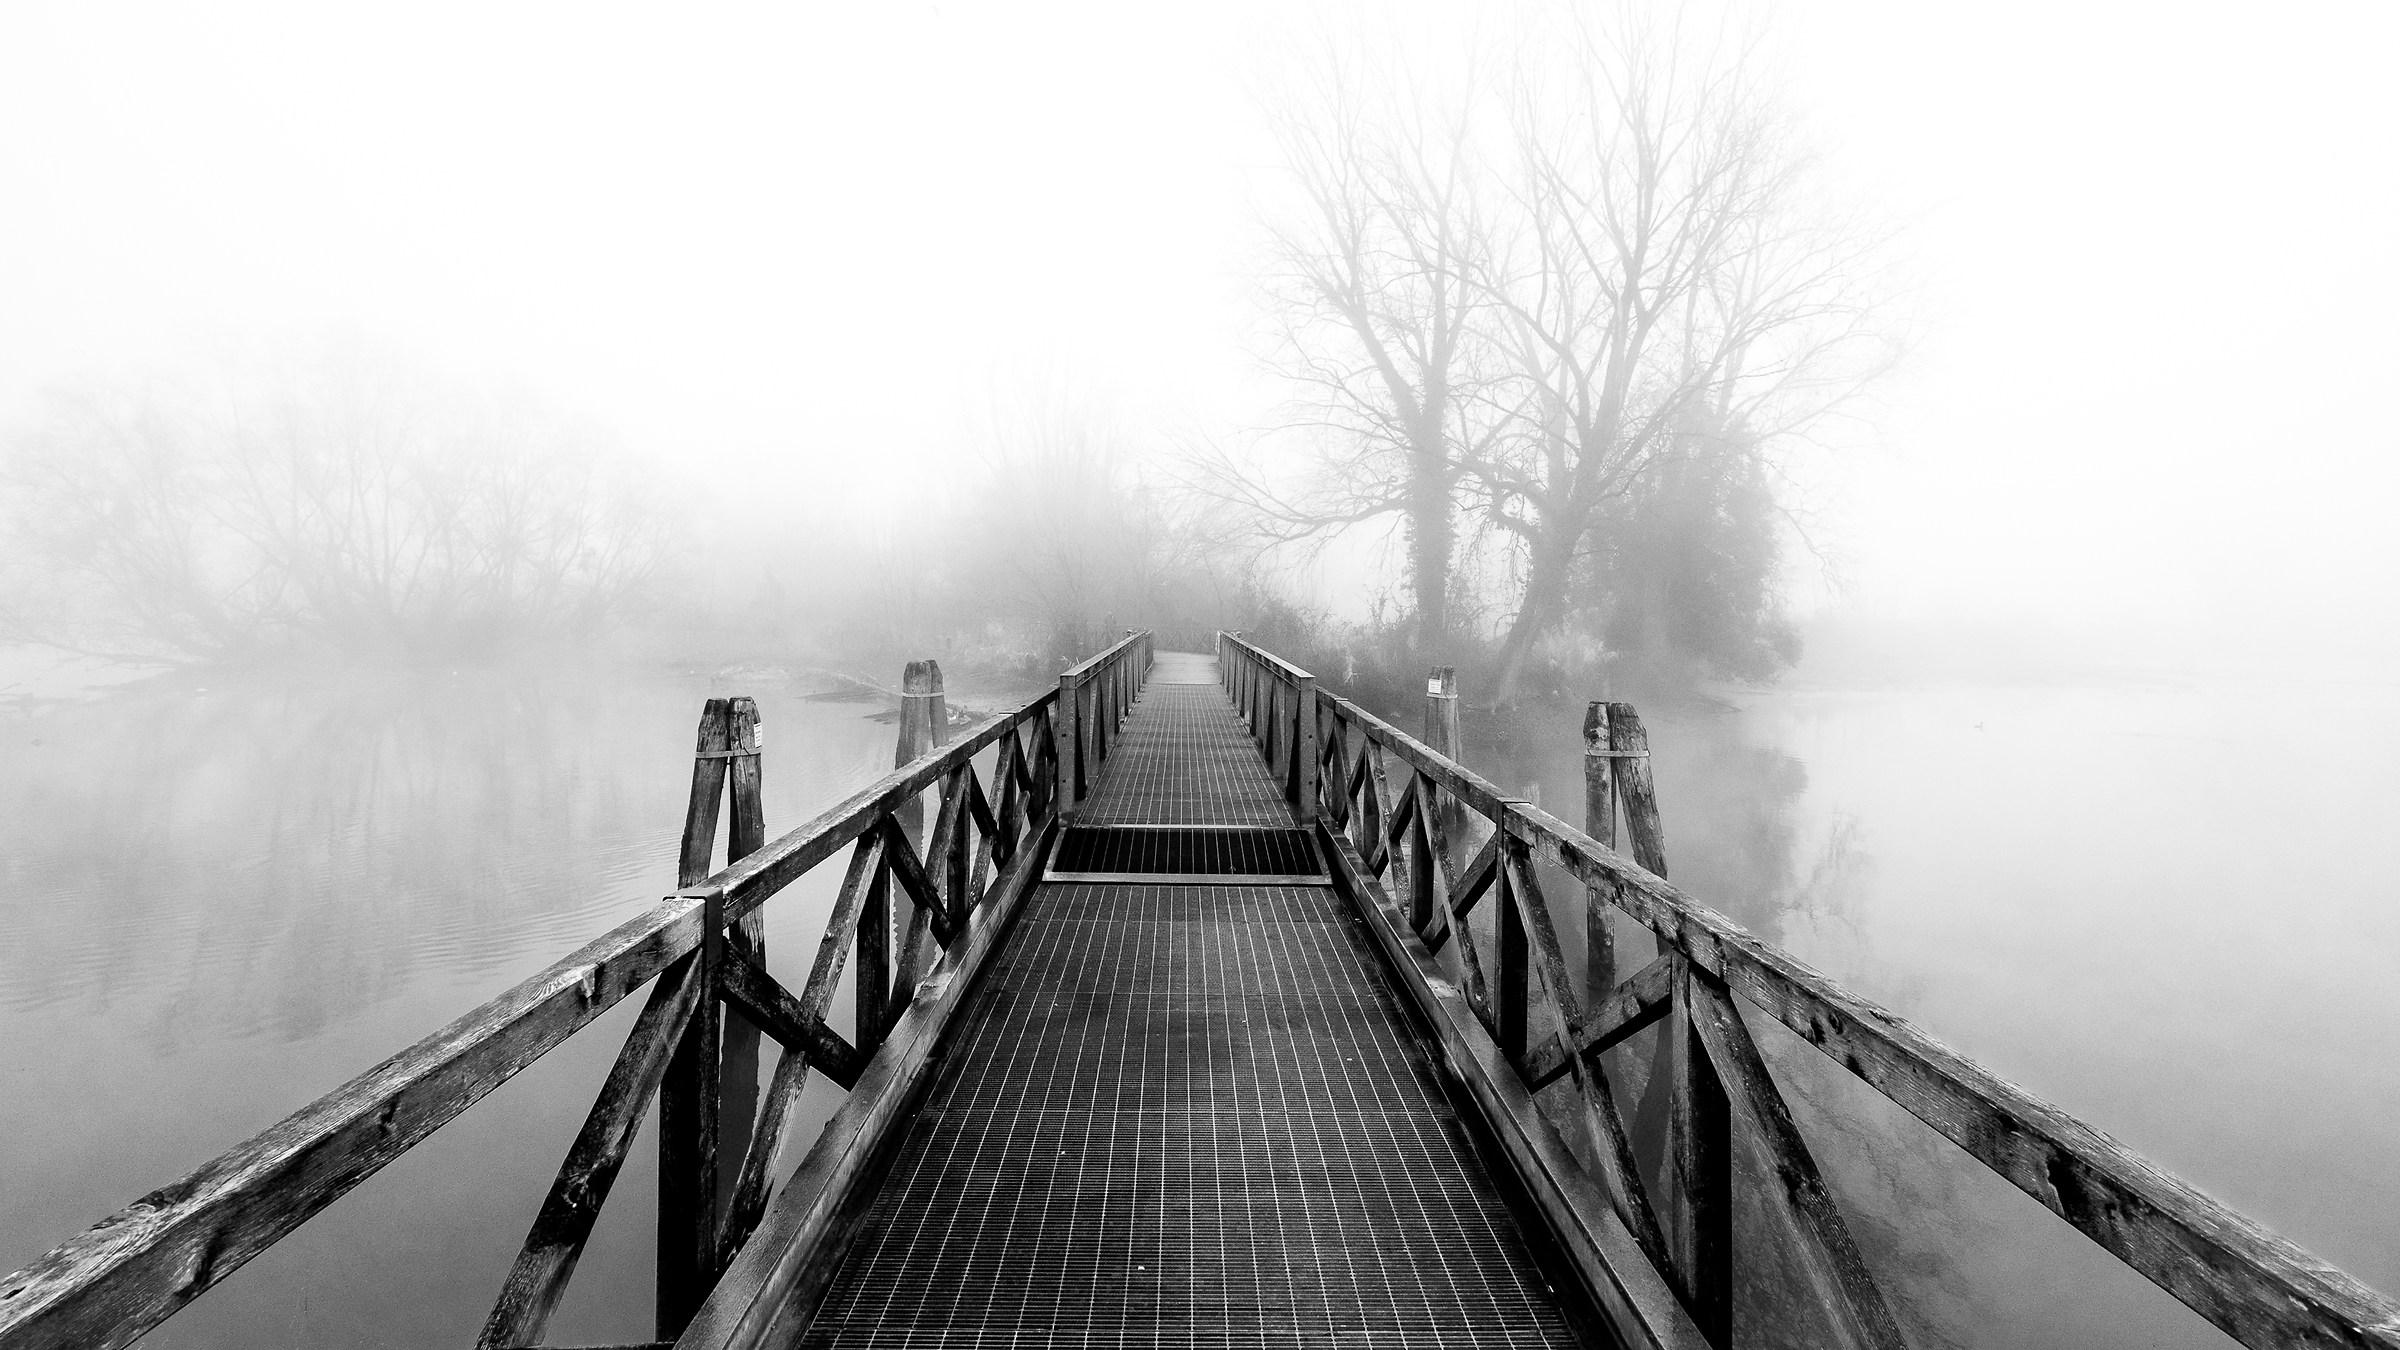 Will remain shrouded in fog...